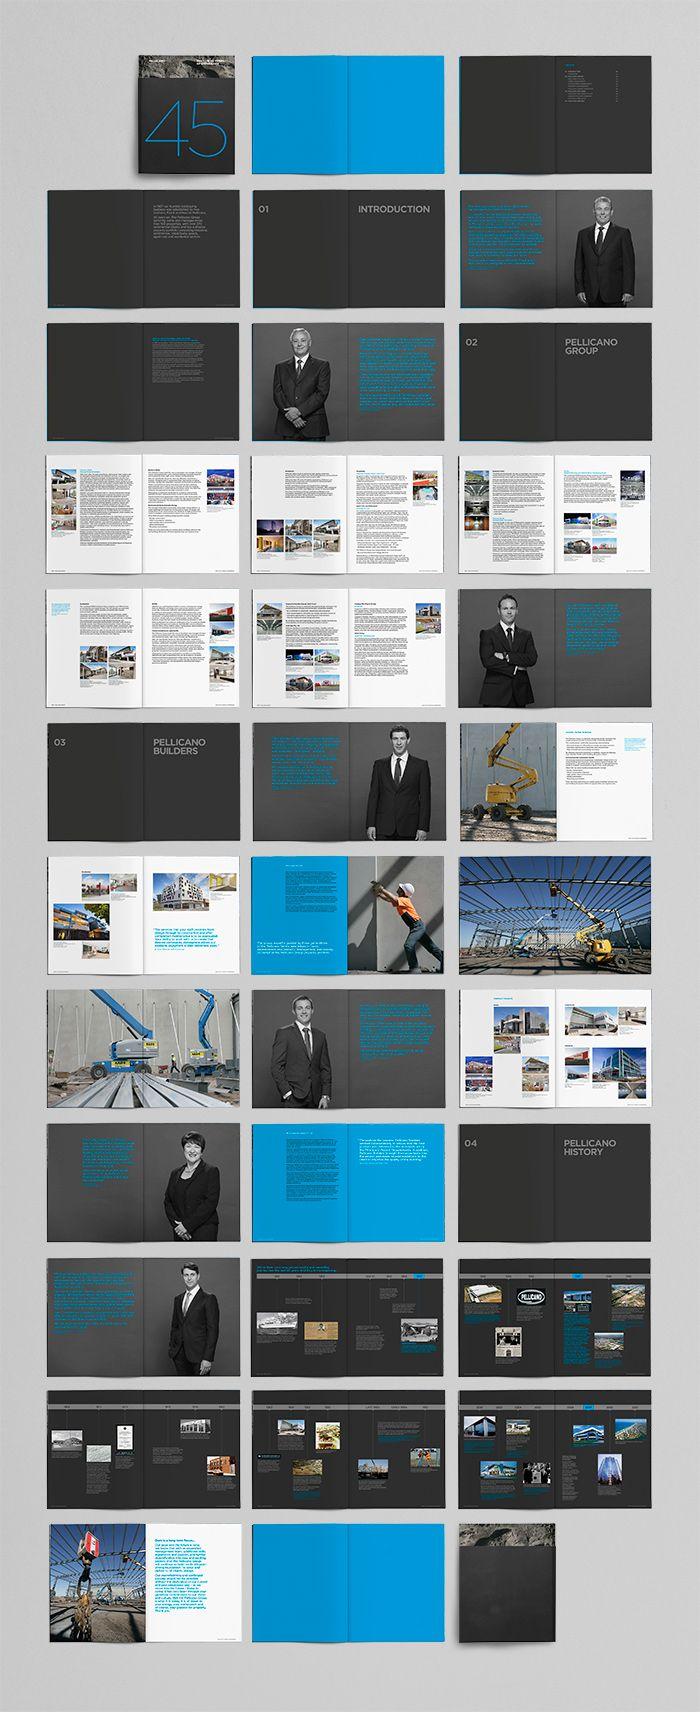 The Pellicano Group  brochure  by Latitude